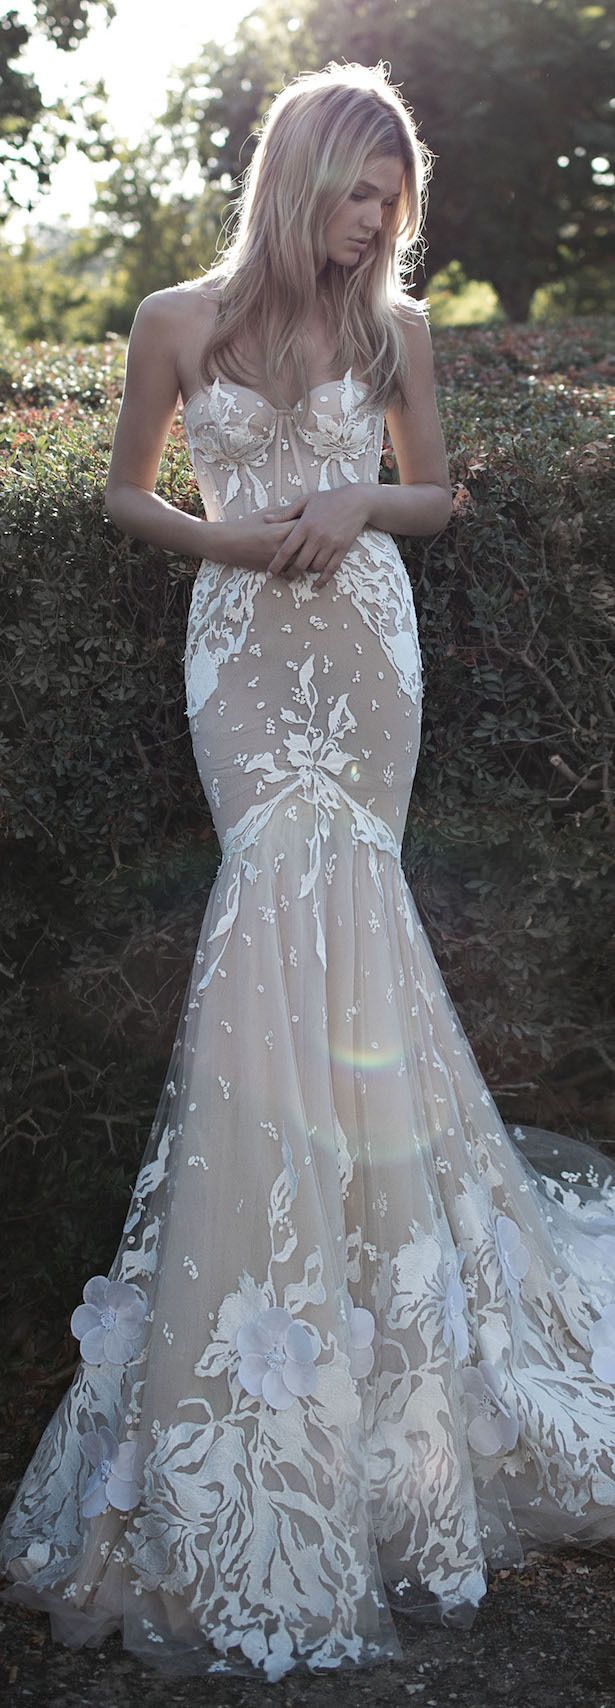 Wedding Dresses by Idan Cohen 2017 Bridal Collection http://bellethemagazine.com/2016/07/wedding-dresses-idan-cohen-2017.html?utm_campaign=coschedule&utm_source=pinterest&utm_medium=Belle%20The%20Magazine&utm_content=Wedding%20Dresses%20by%20Idan%20Cohen%202017%20Bridal%20Collection